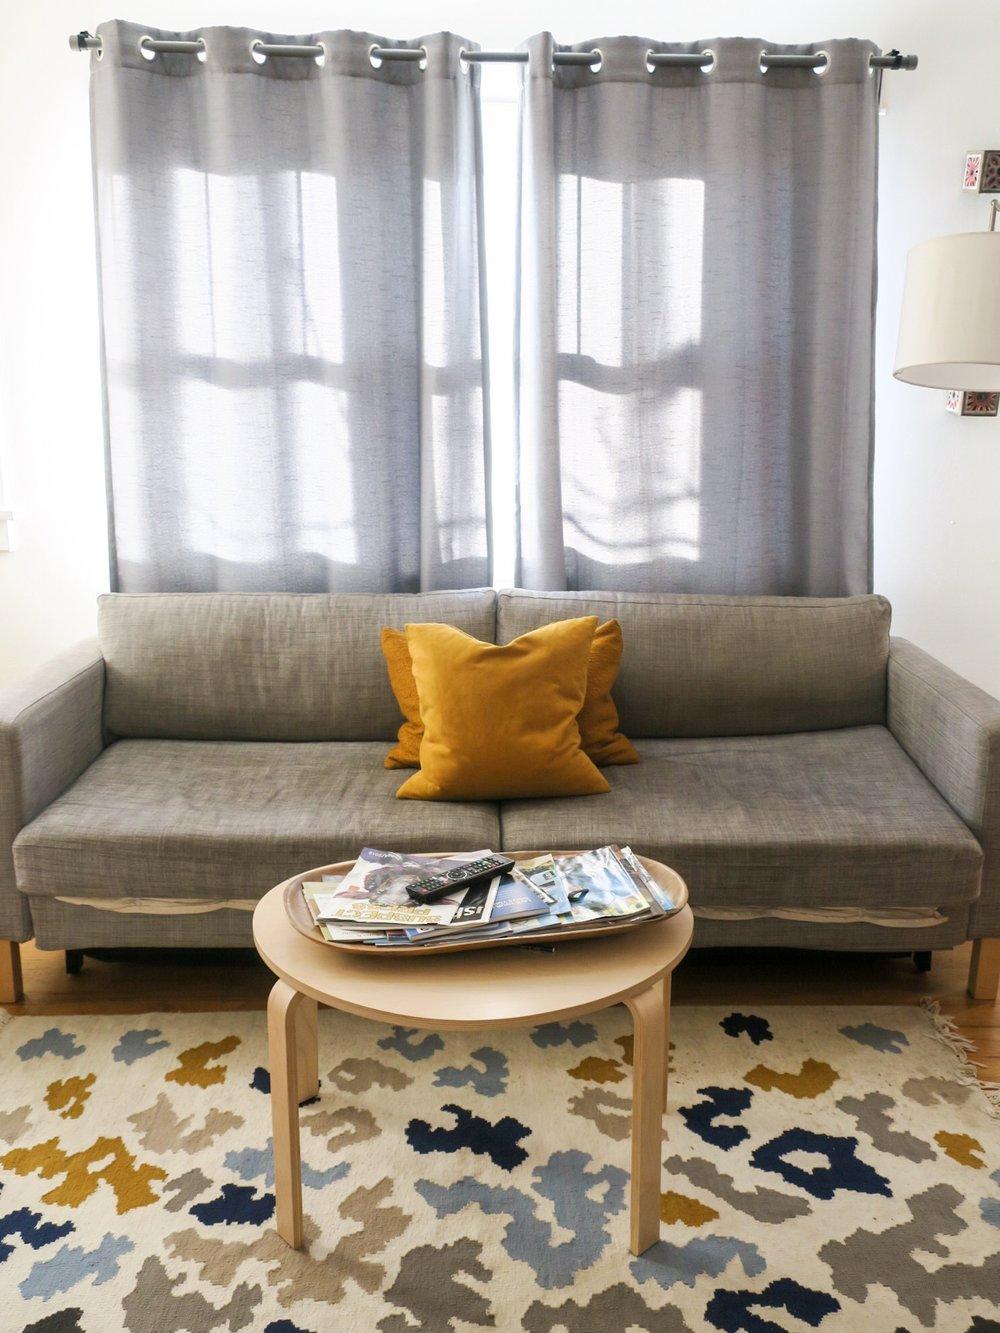 fashion by day denver airbnb.JPEG